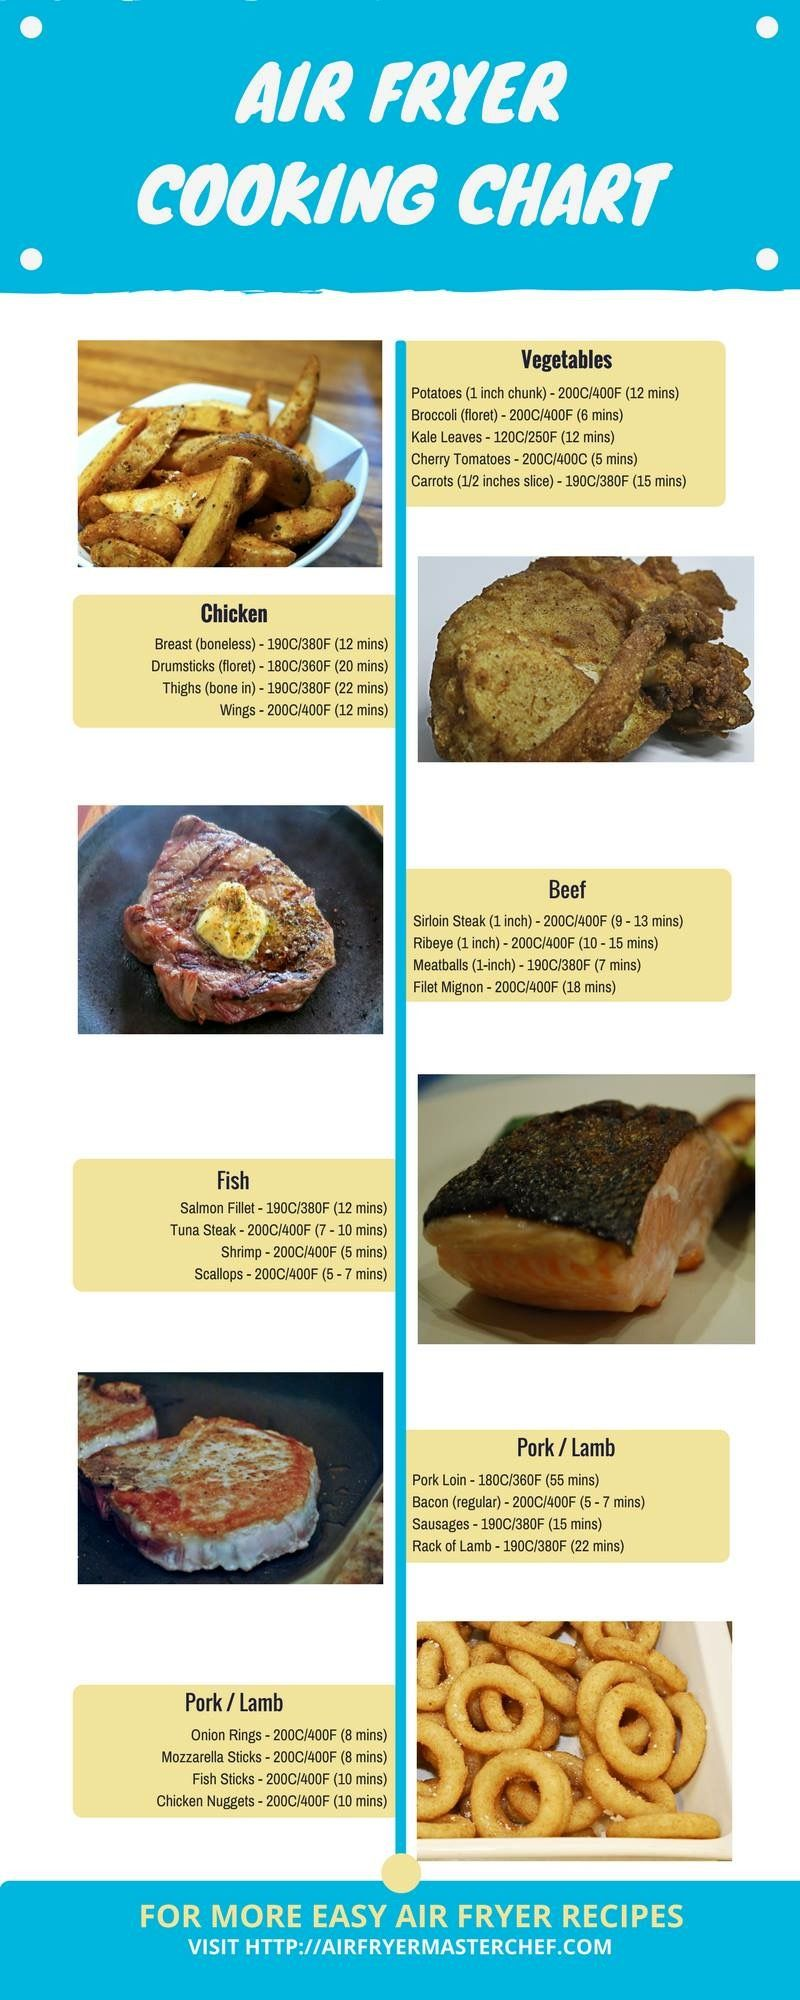 Air Fryer Cooking Chart Air Fryer Recipes Air Frier Recipes